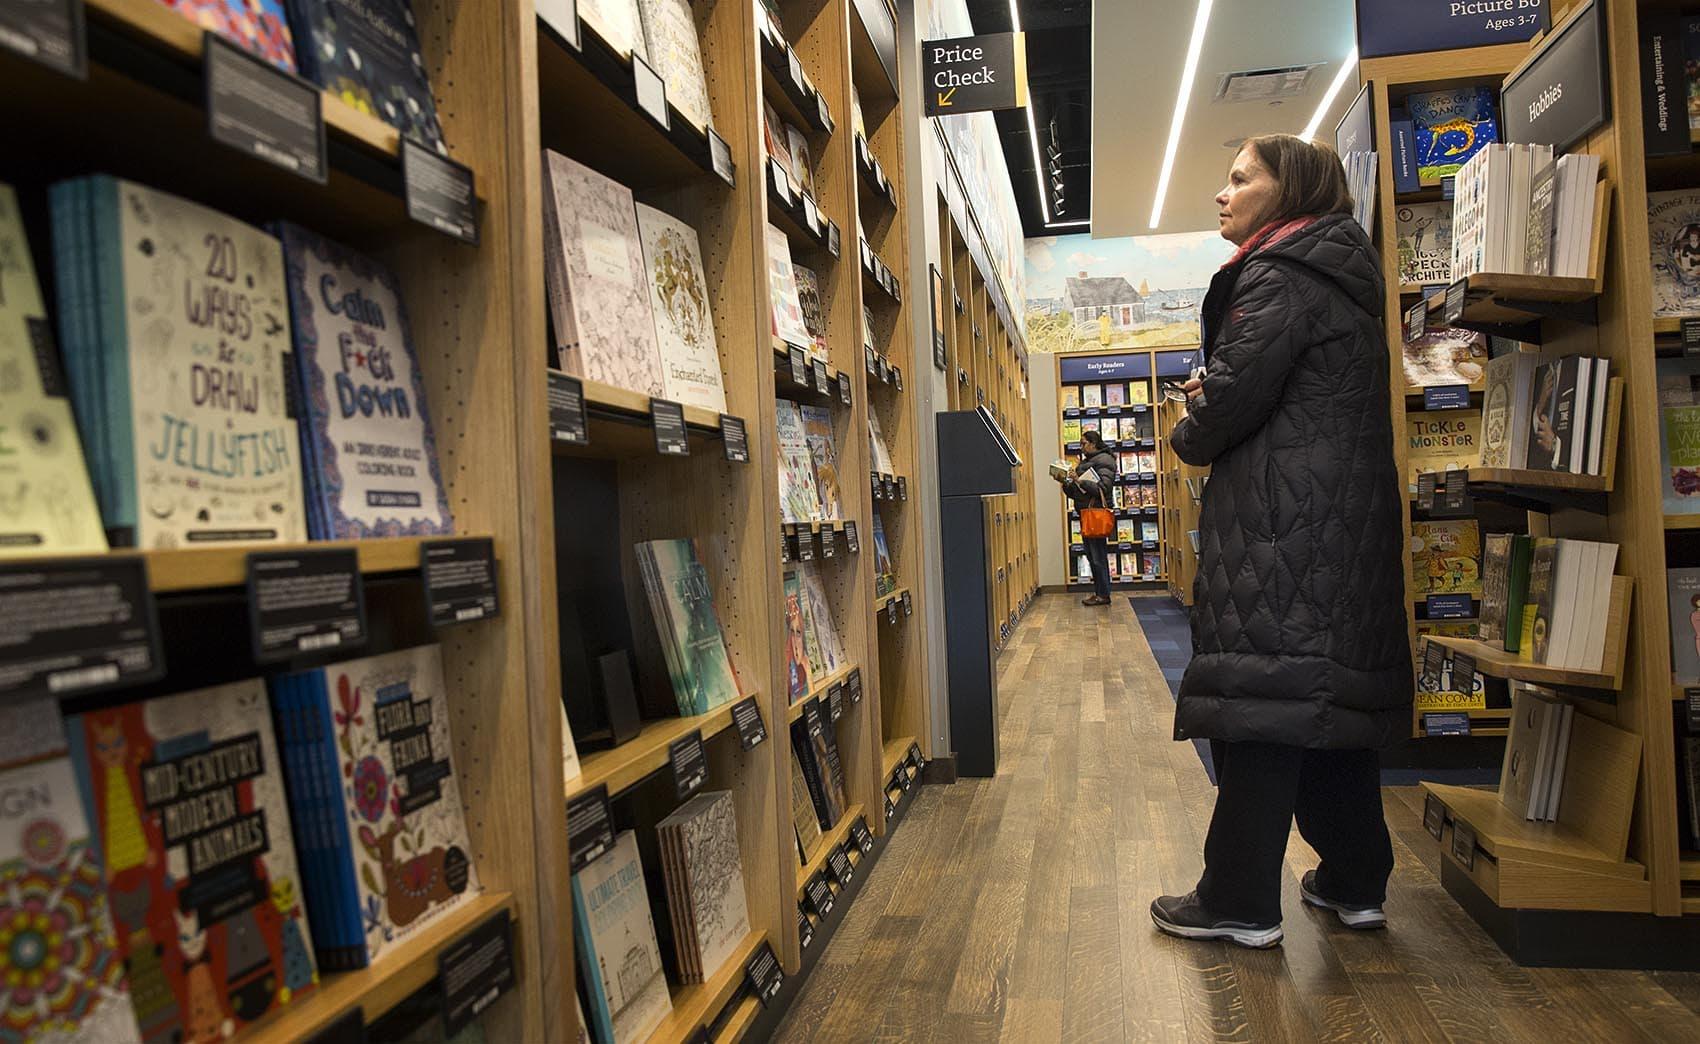 Amazon's First East Coast Bookstore Opens In Mass  | Bostonomix